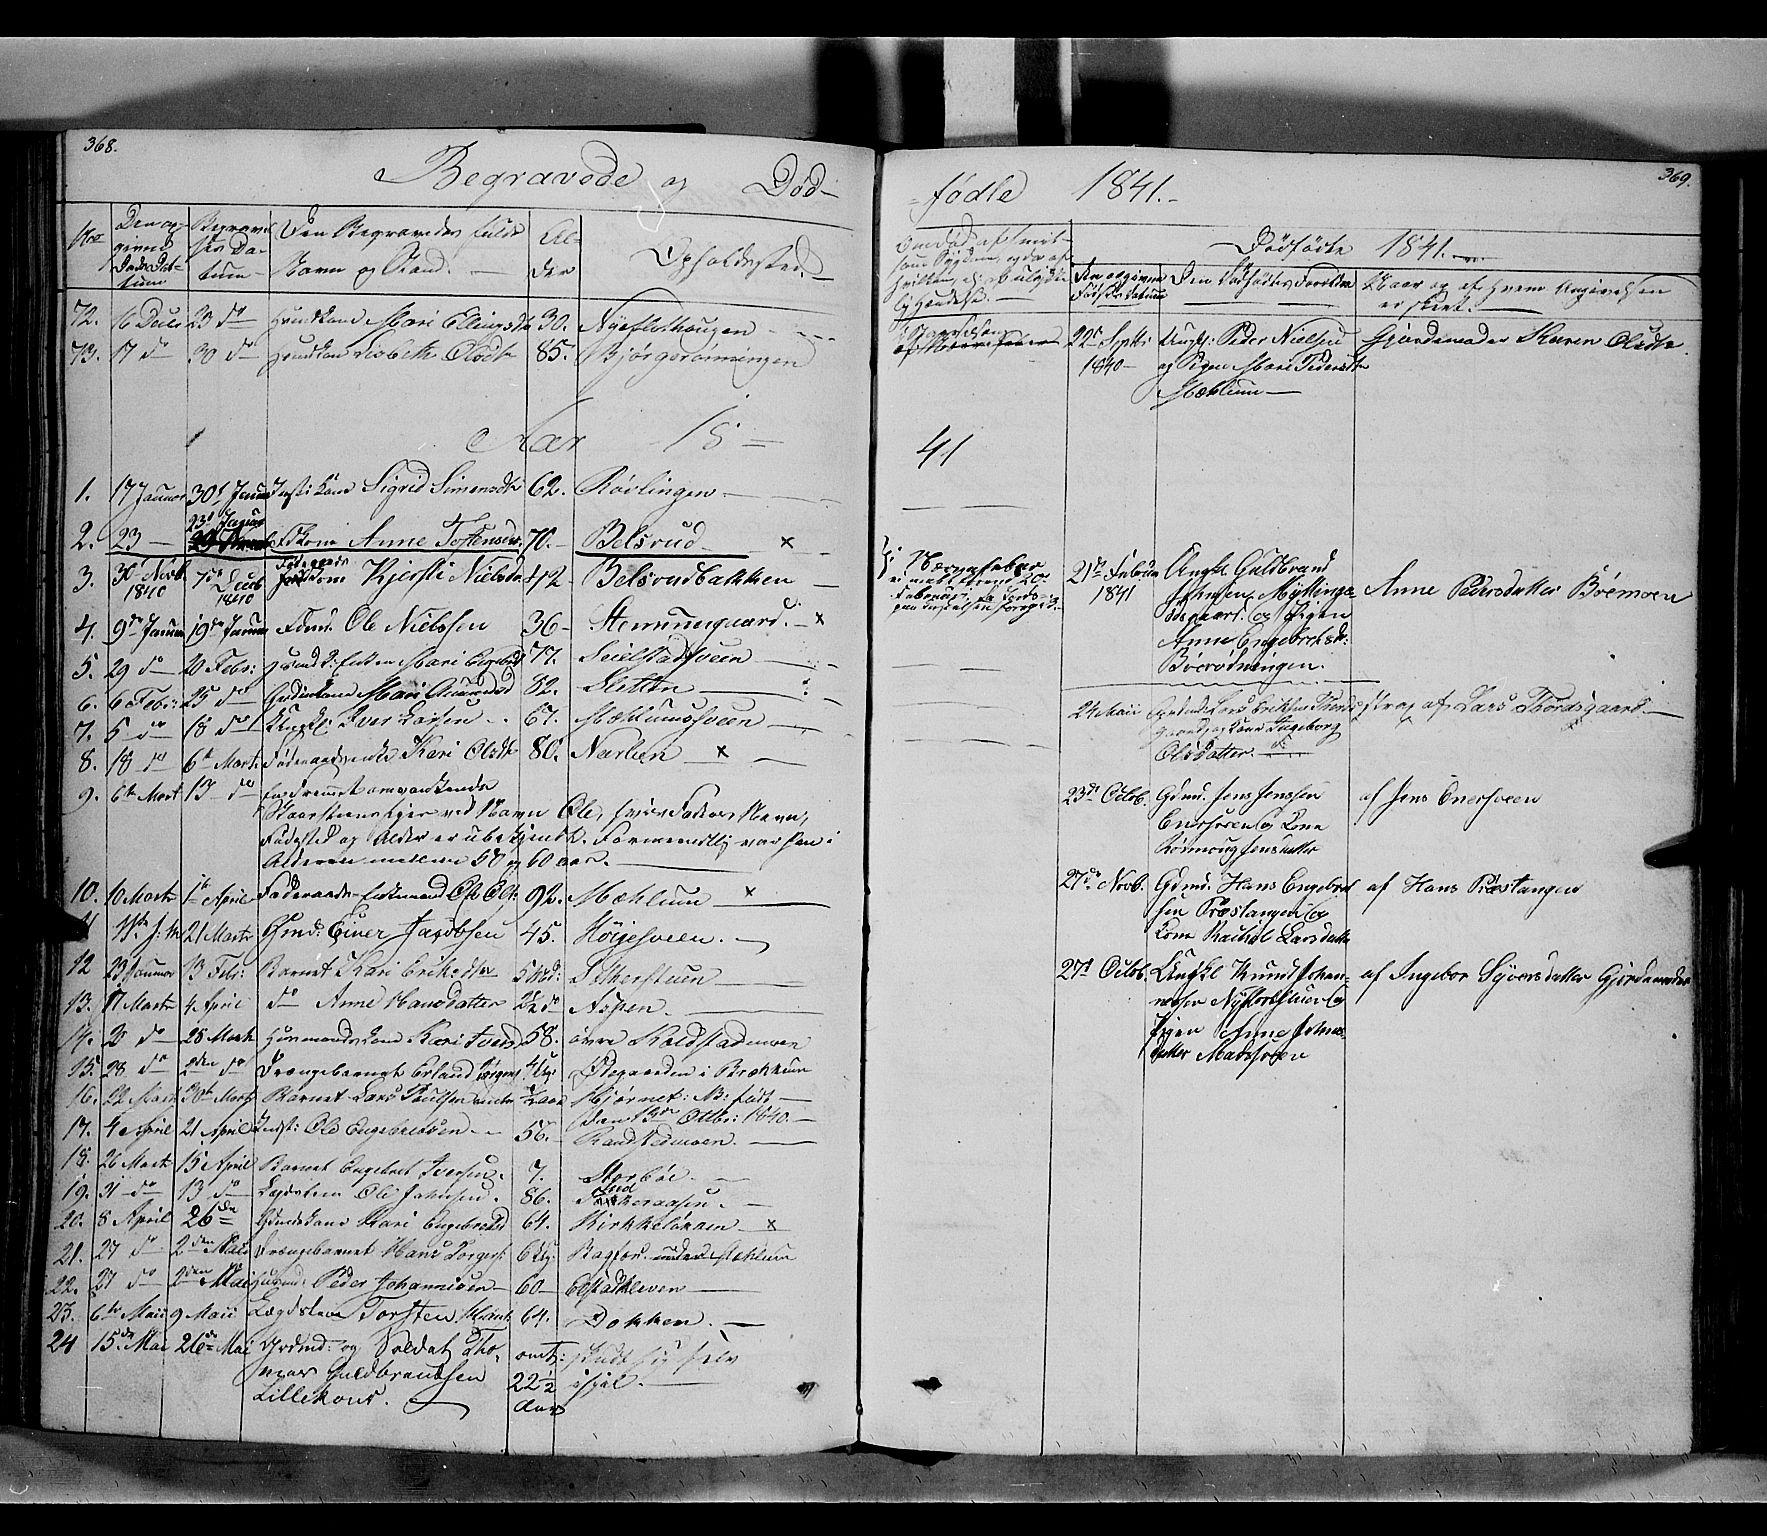 SAH, Ringebu prestekontor, Ministerialbok nr. 5, 1839-1848, s. 368-369